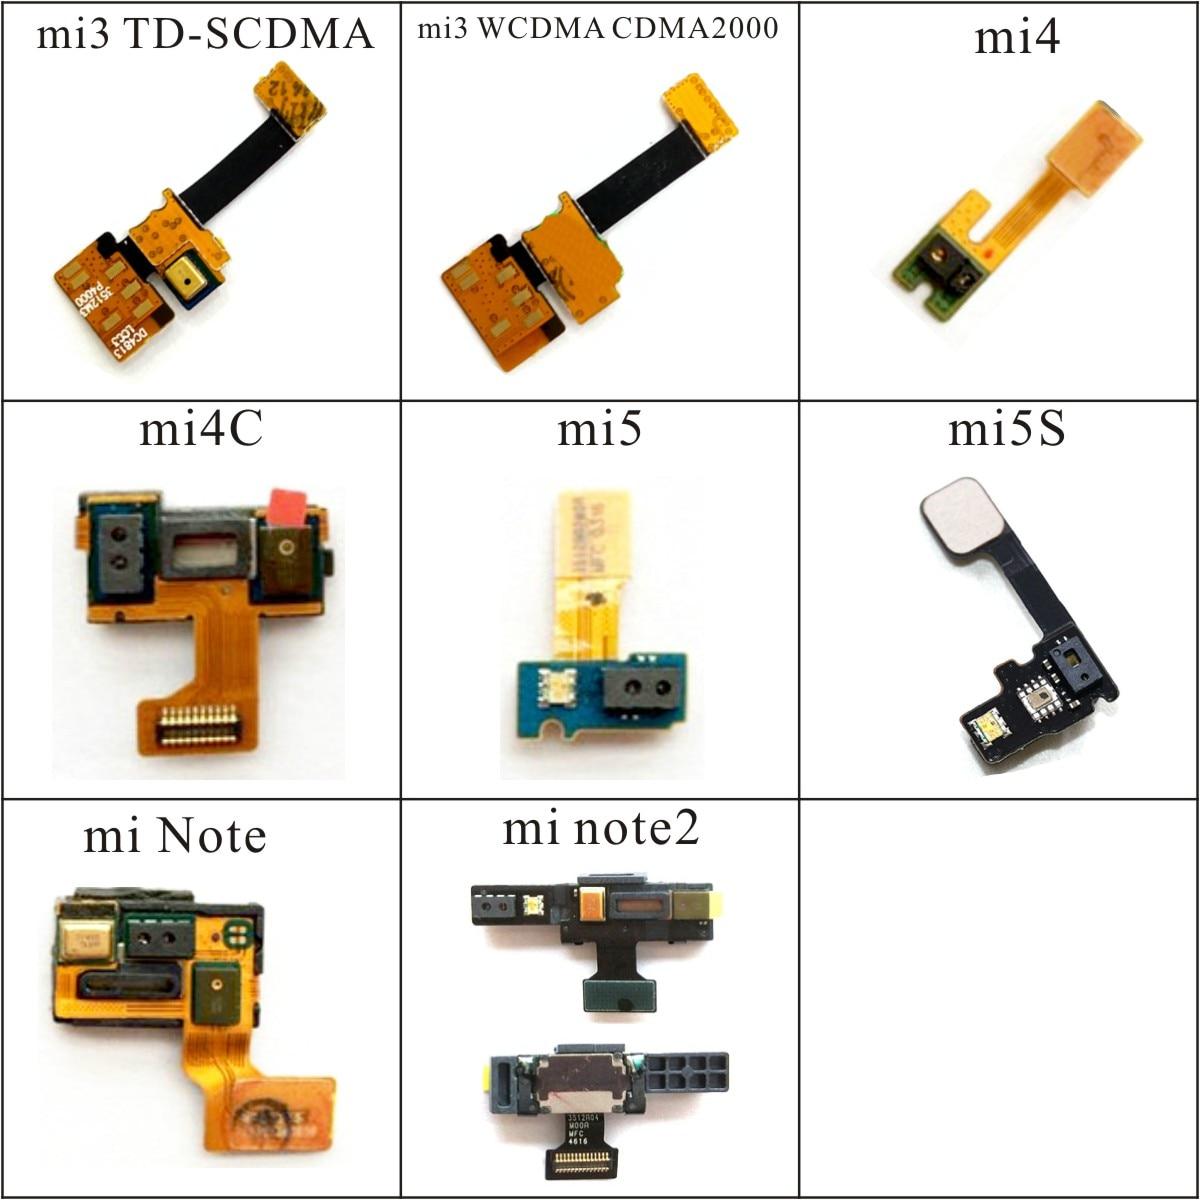 Proximity Light Sensor Flex Cable Distance Sensing Connector For Xiaomi Mi3 Mi4 4C Mi5 5S Note 2 TD-SCDMA WCDMA Replacement Part